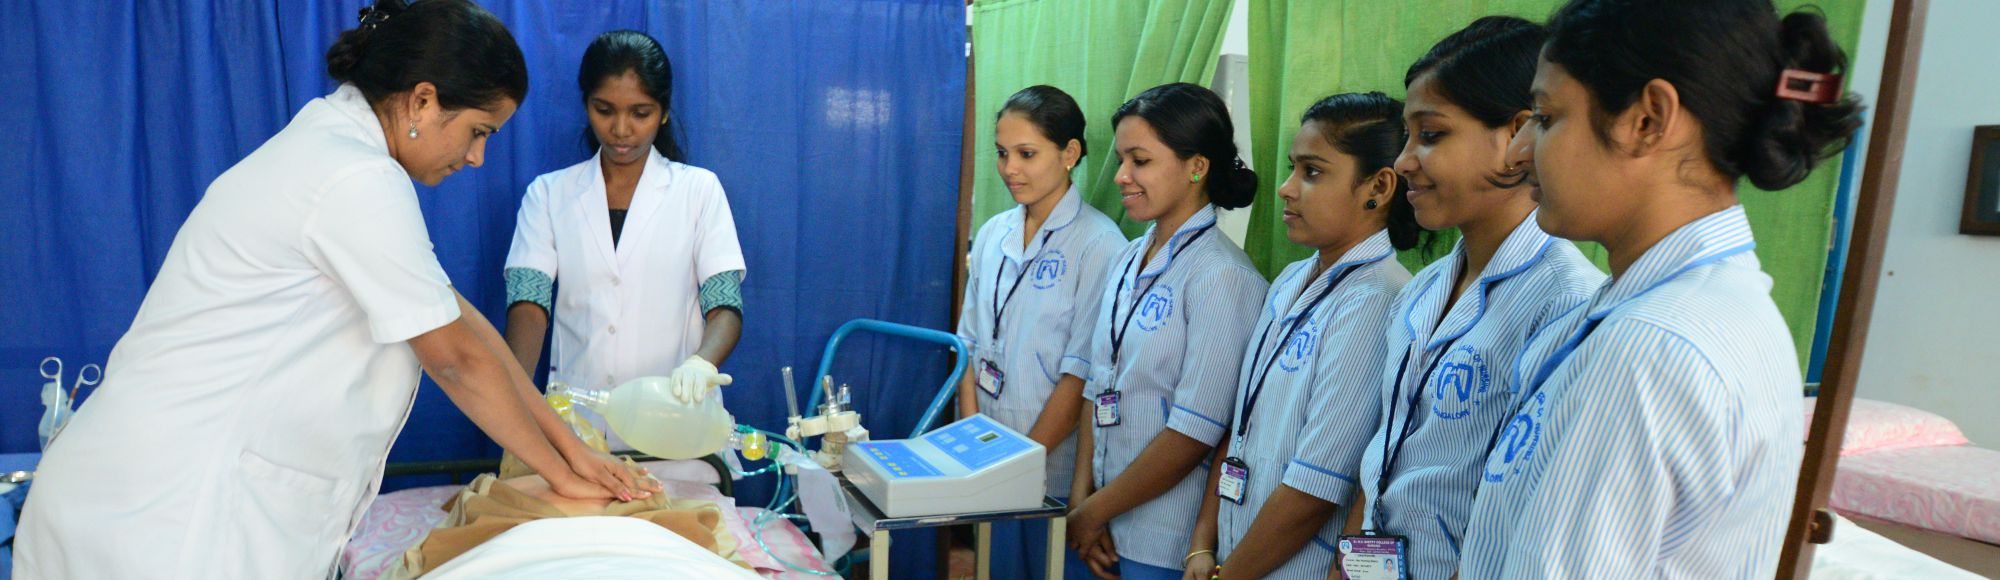 Dr. MV Shetty College of Nursing Image